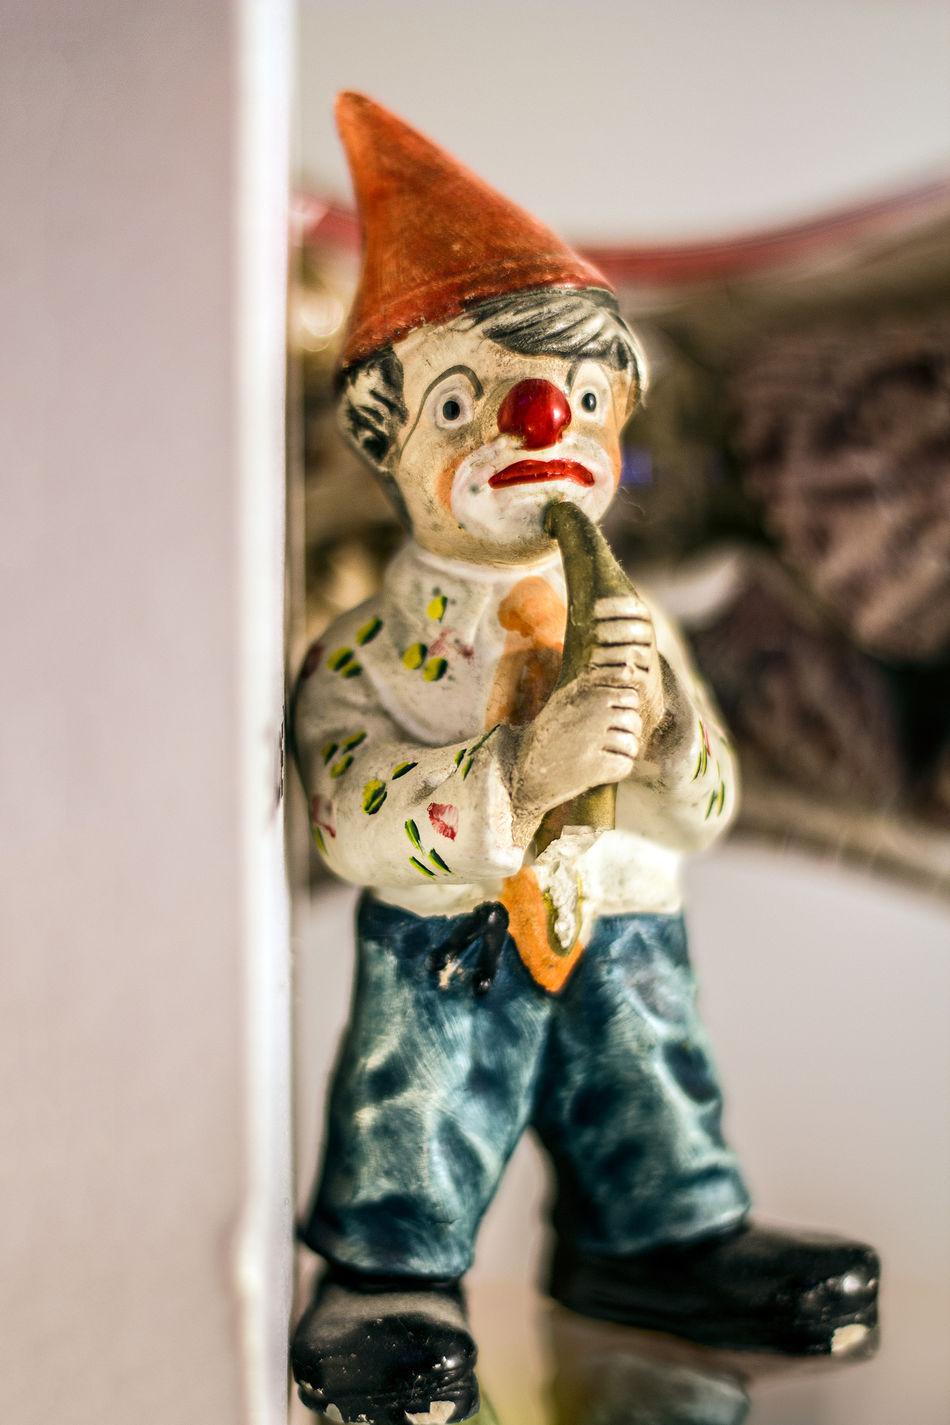 Payaso triste al saxo // Sad clown with saxo Clown Sadclown Payaso Payaso Triste Saxophone Saxofon Figura Figure Macro Photography Stock Stockphotography